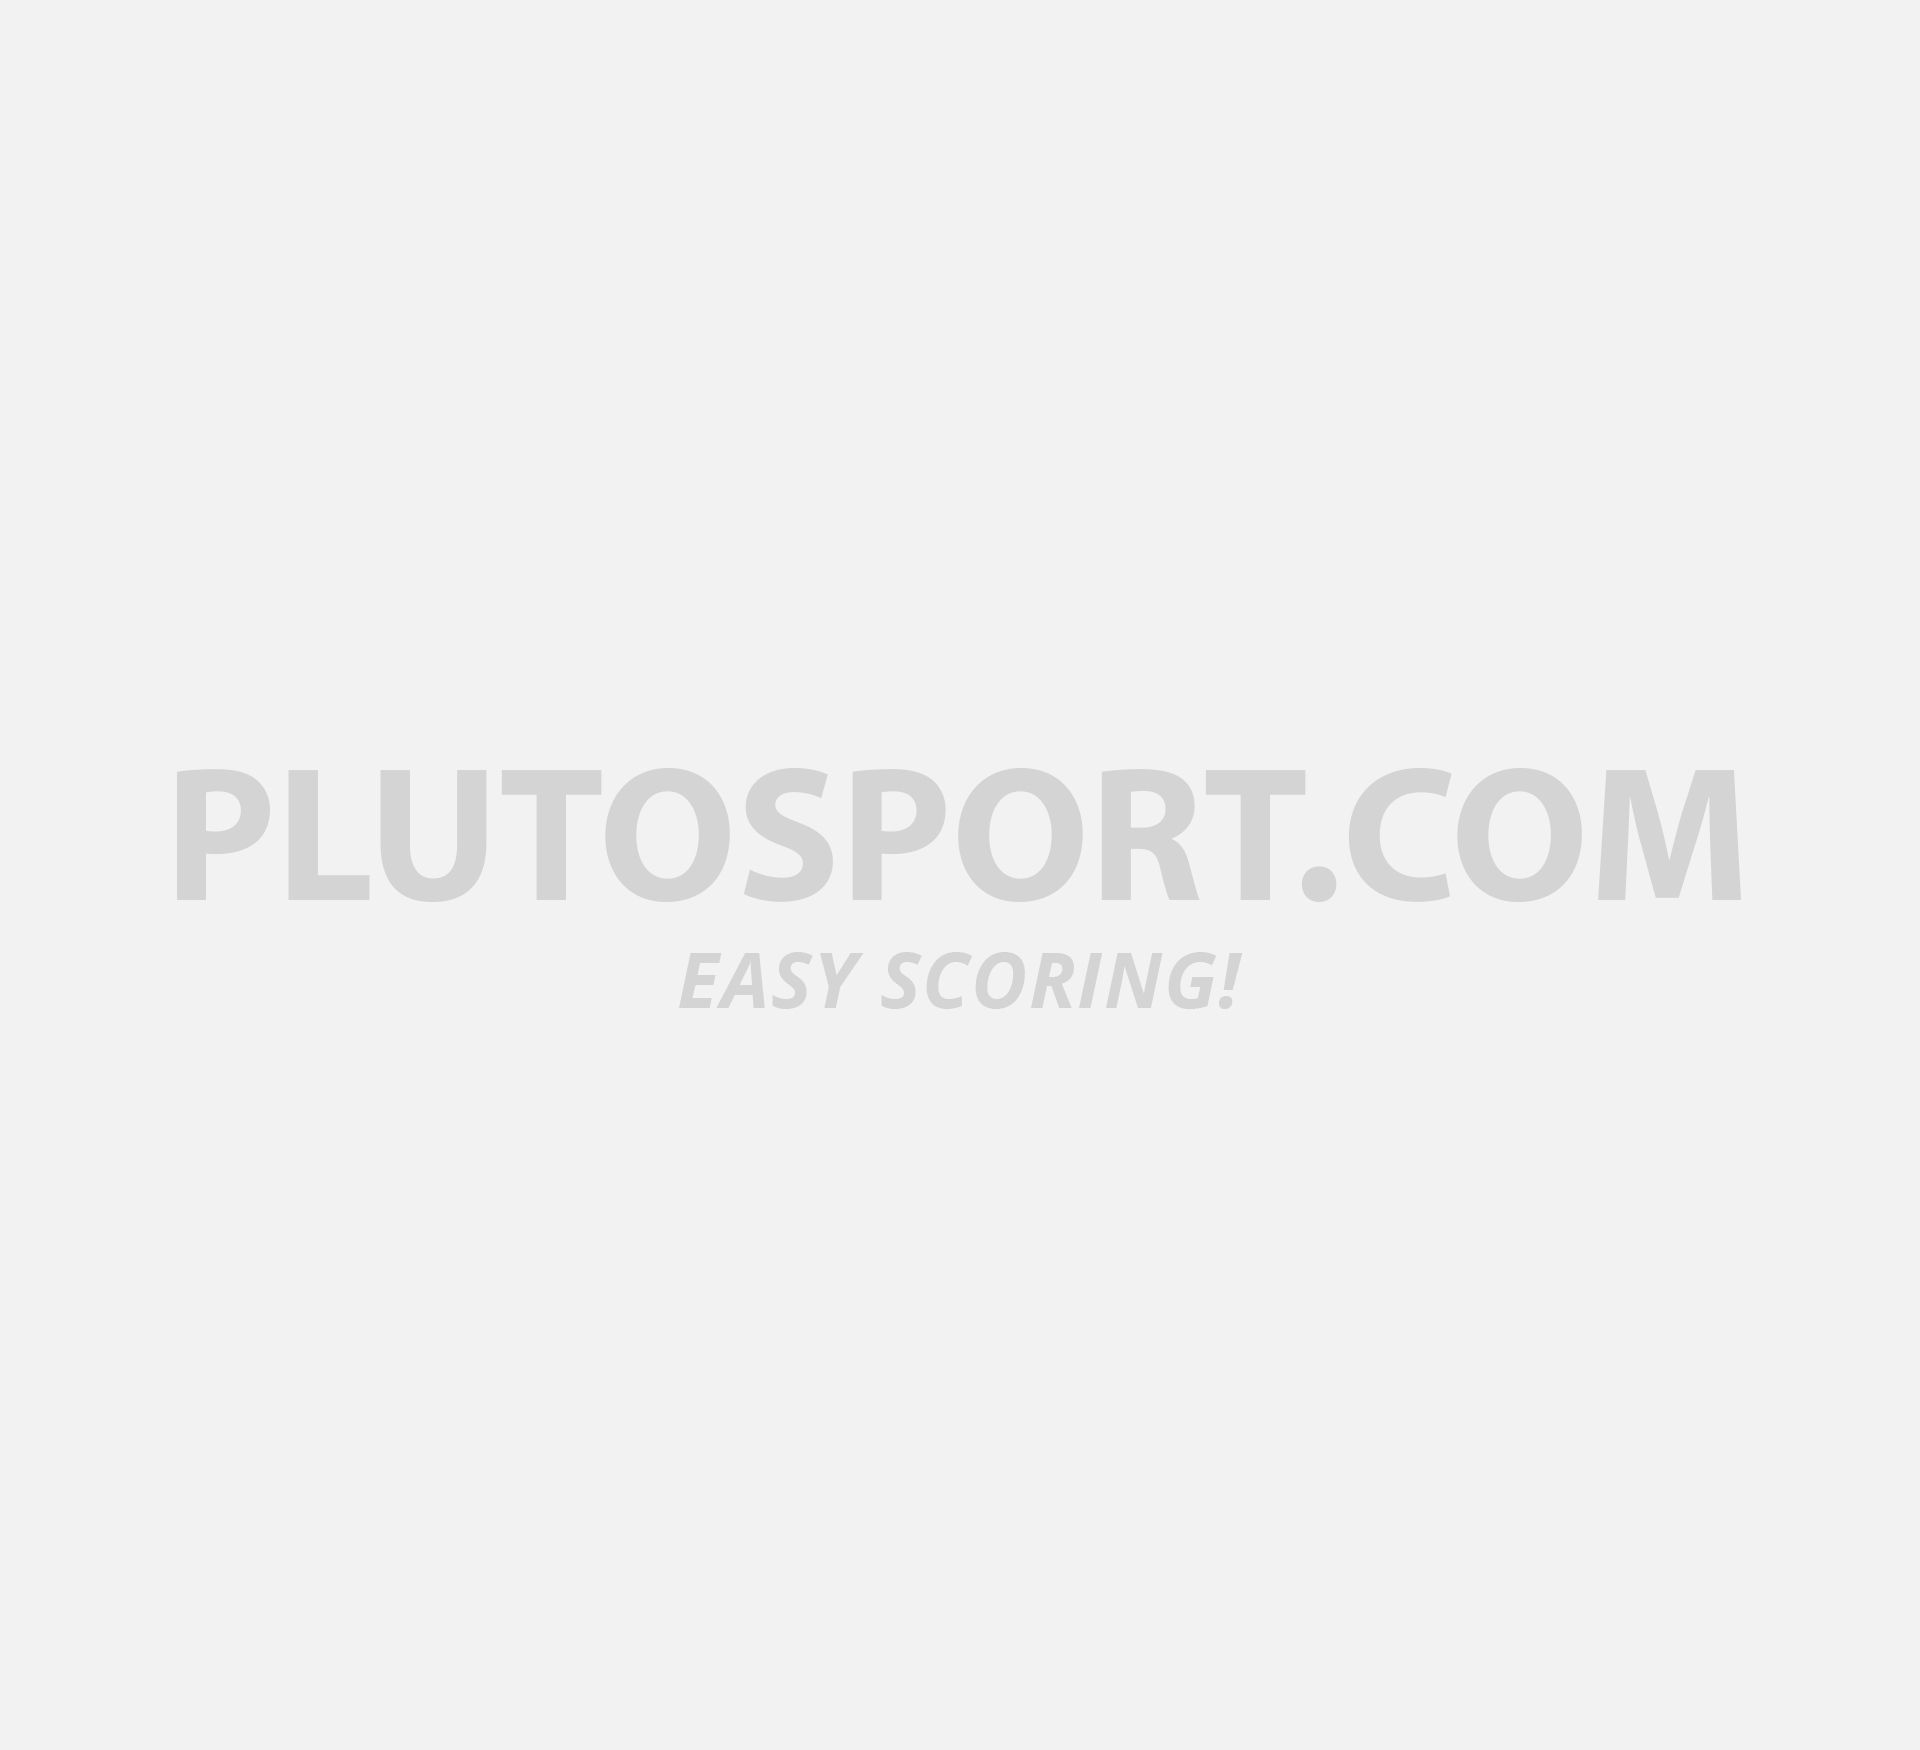 pretty nice 9e9c4 33680 Nike Court Lite Clay - Gravel - Shoes - Tennis - Sports  Plu